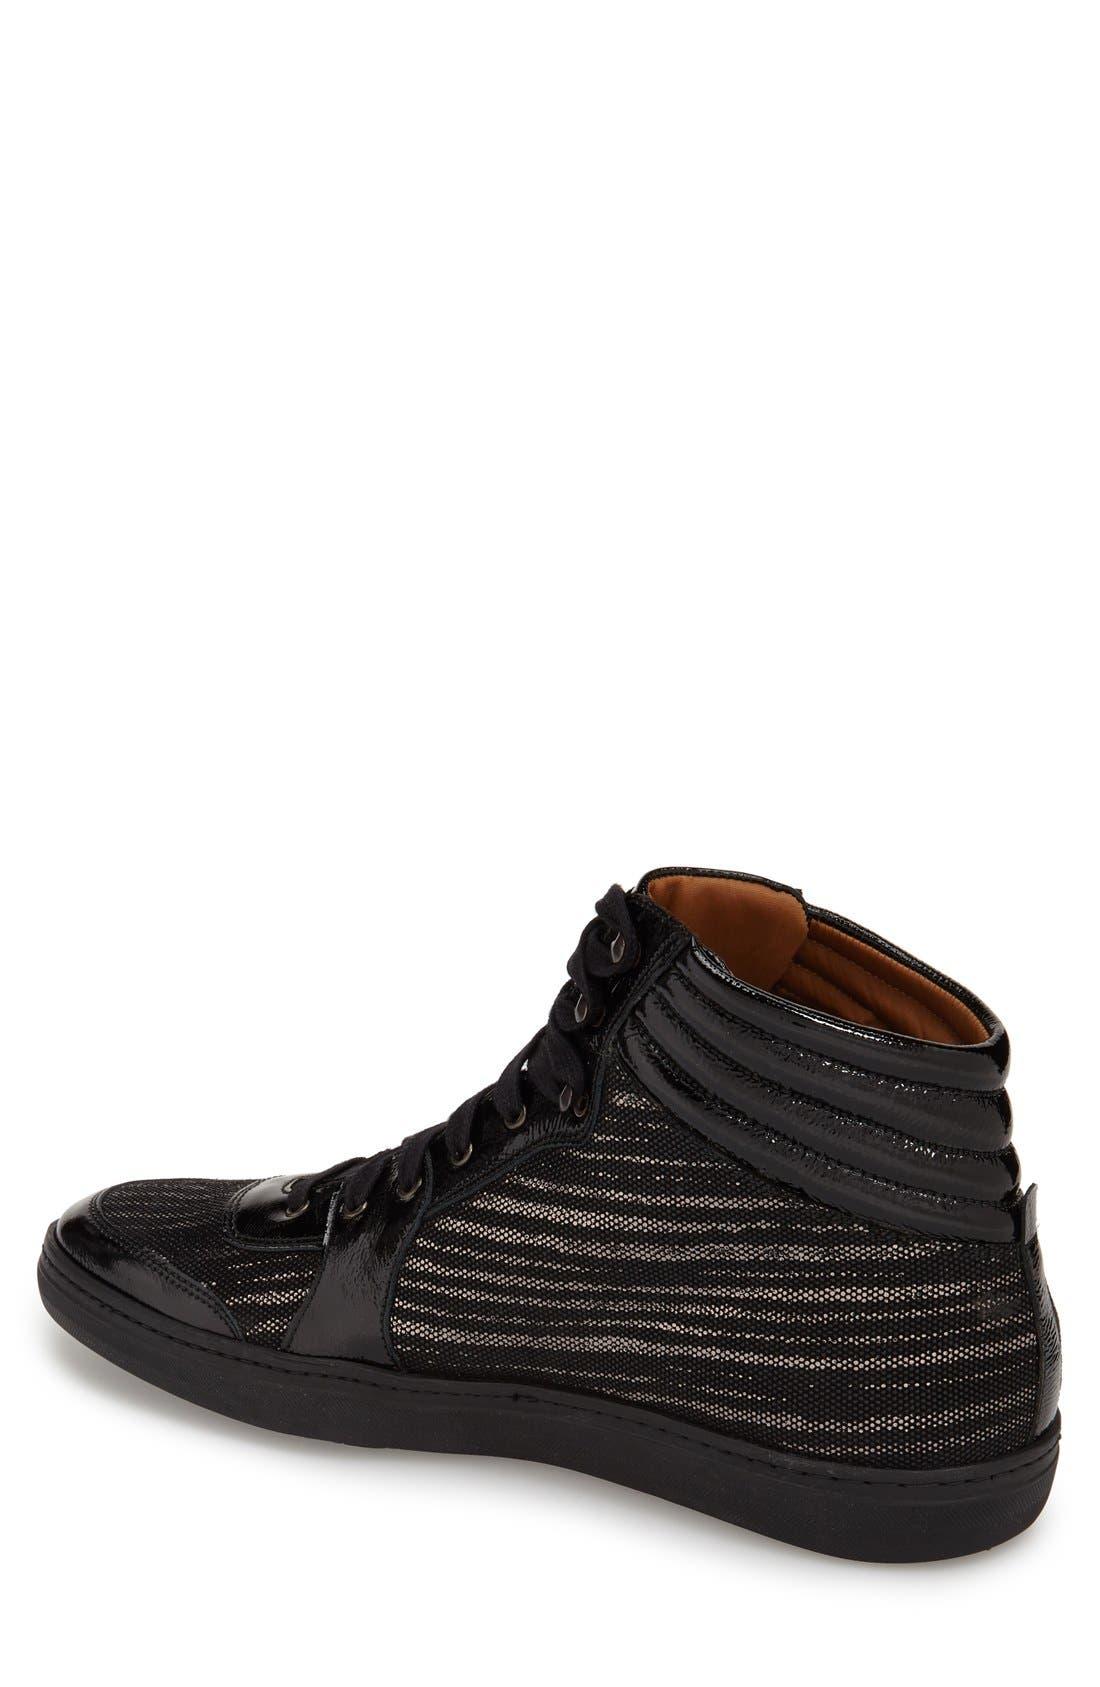 'Bordeau' Sneaker,                             Alternate thumbnail 2, color,                             001